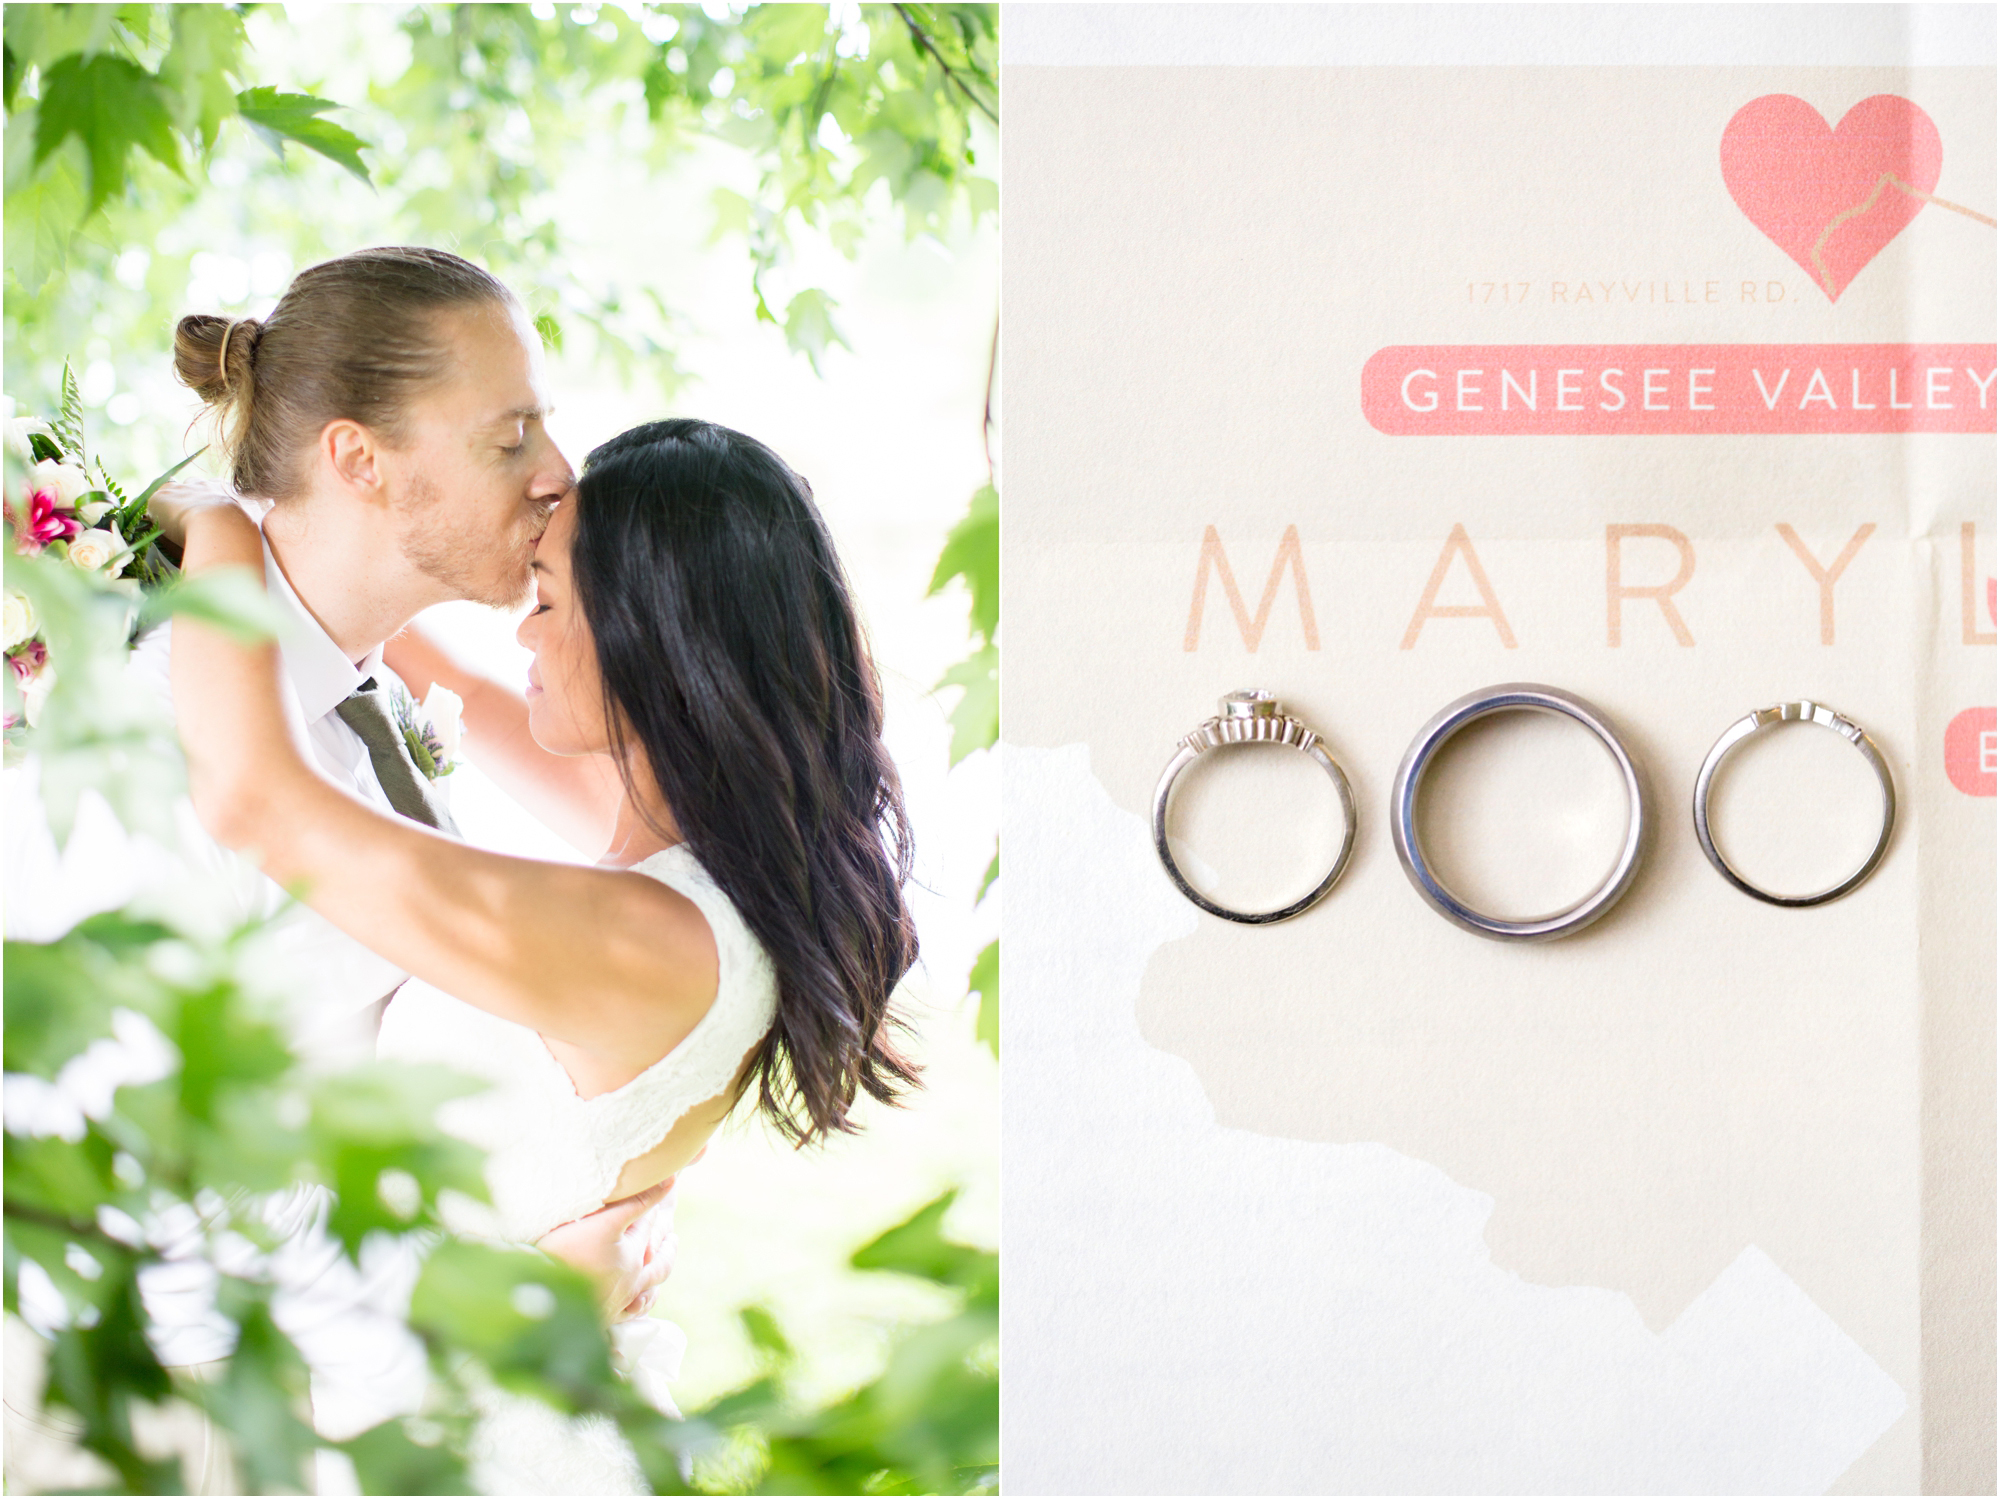 2-Hamby Wedding Bride & Groom Portraits-526_annagracephotography maryland wedding photographer genesee valley.jpg